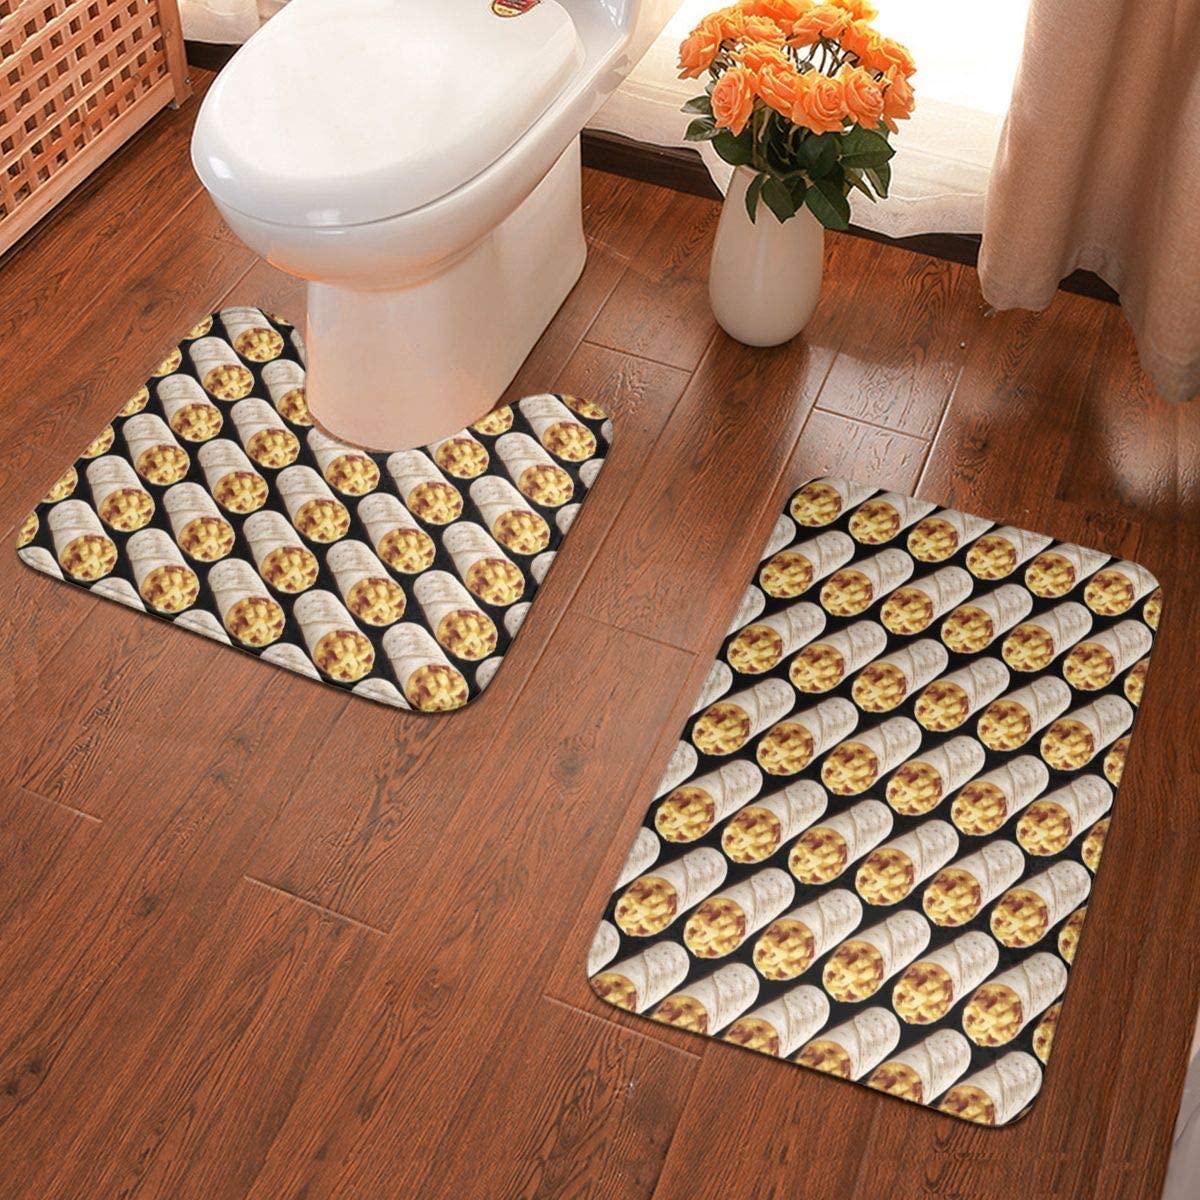 NiYoung Bathroom Rug Mats Set 2 Piece Anti-Skid Pads Bath Mat + Contour (Taco Burrito Pattern Black)